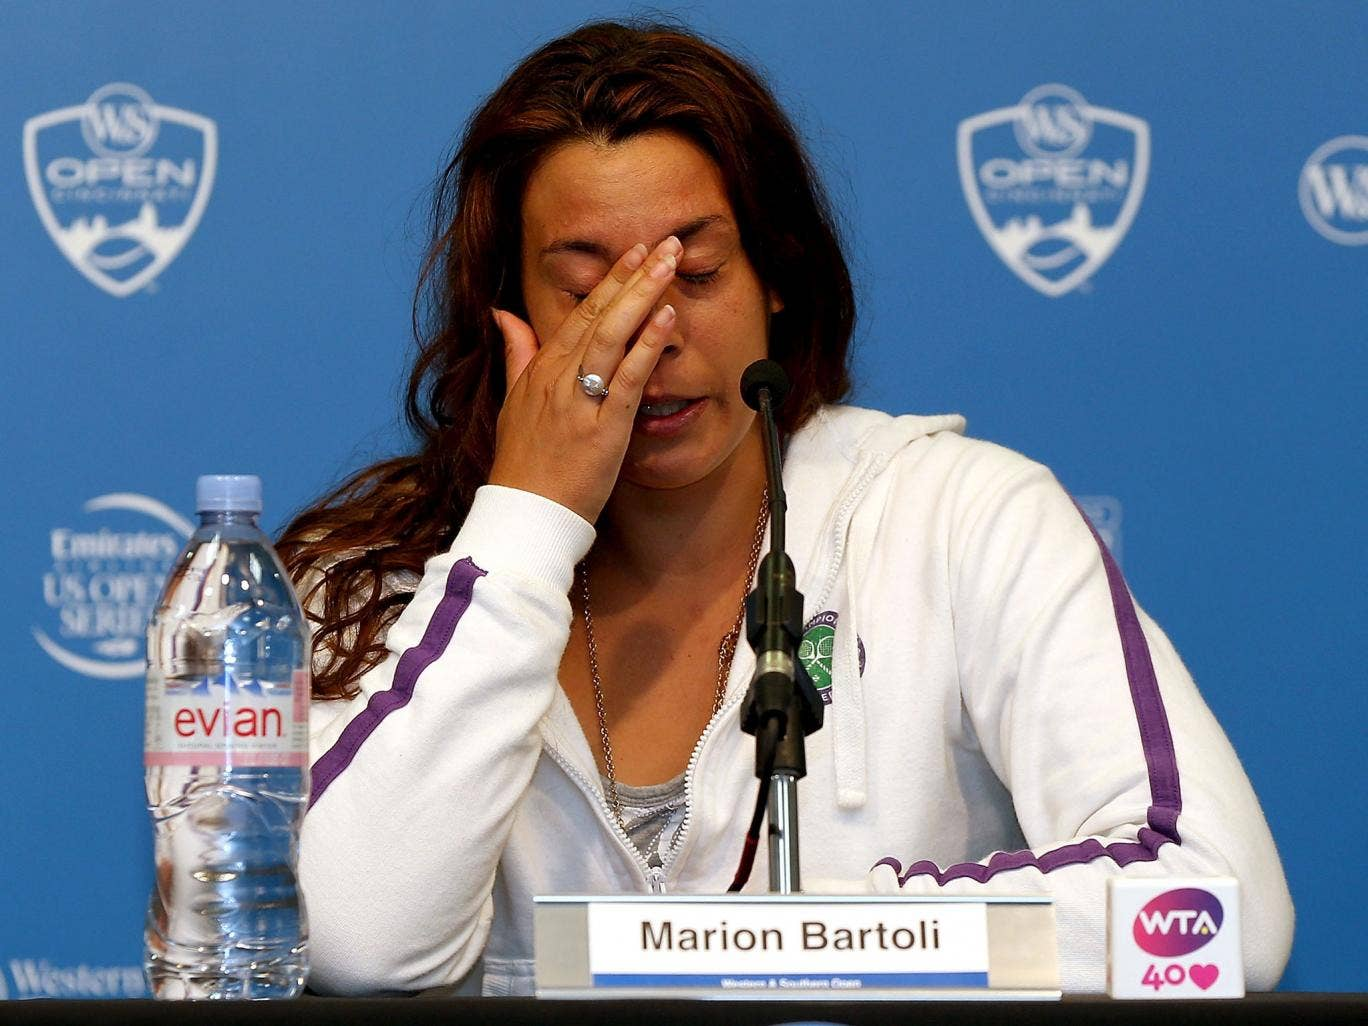 Marion Bartoli announces her retirement